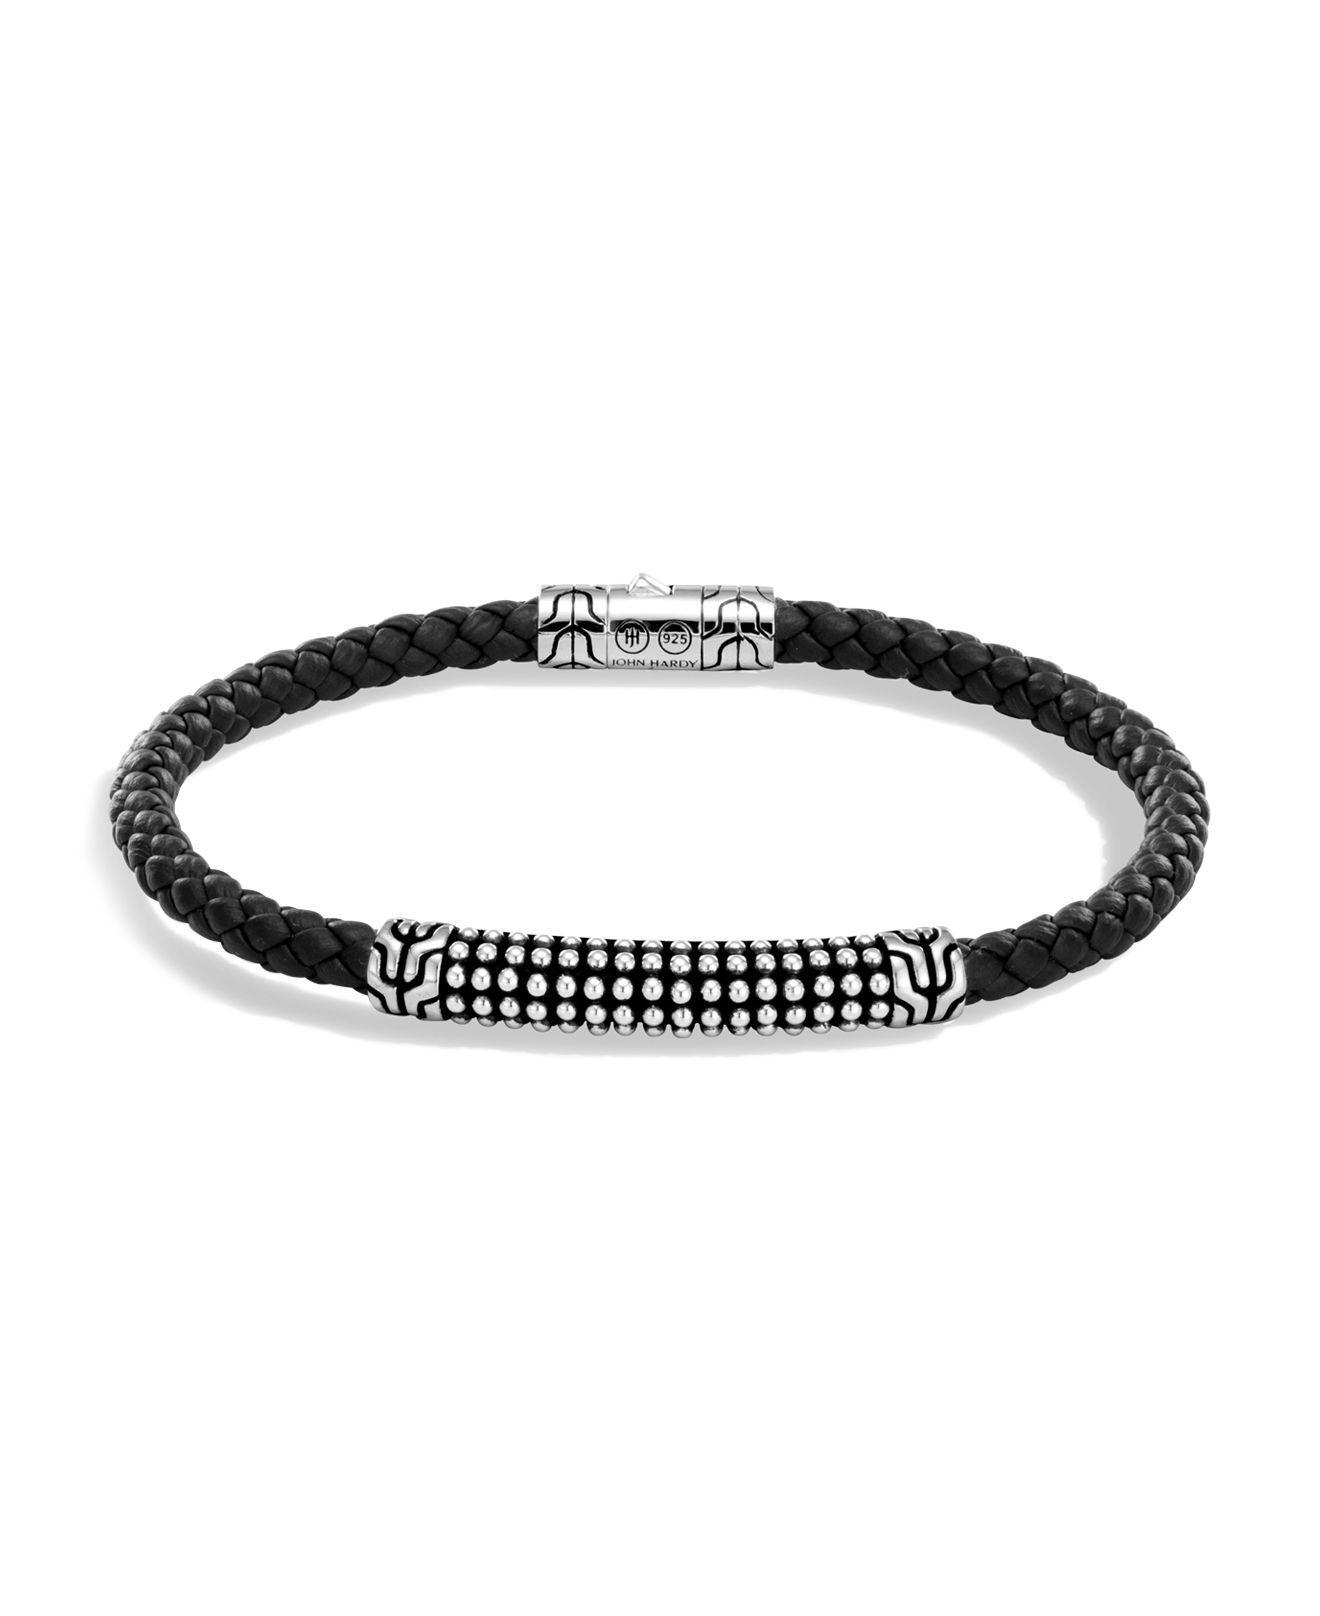 John Hardy Mens Classic Chain Link Jawan Sterling Silver Bracelet Vv76bY3Tl